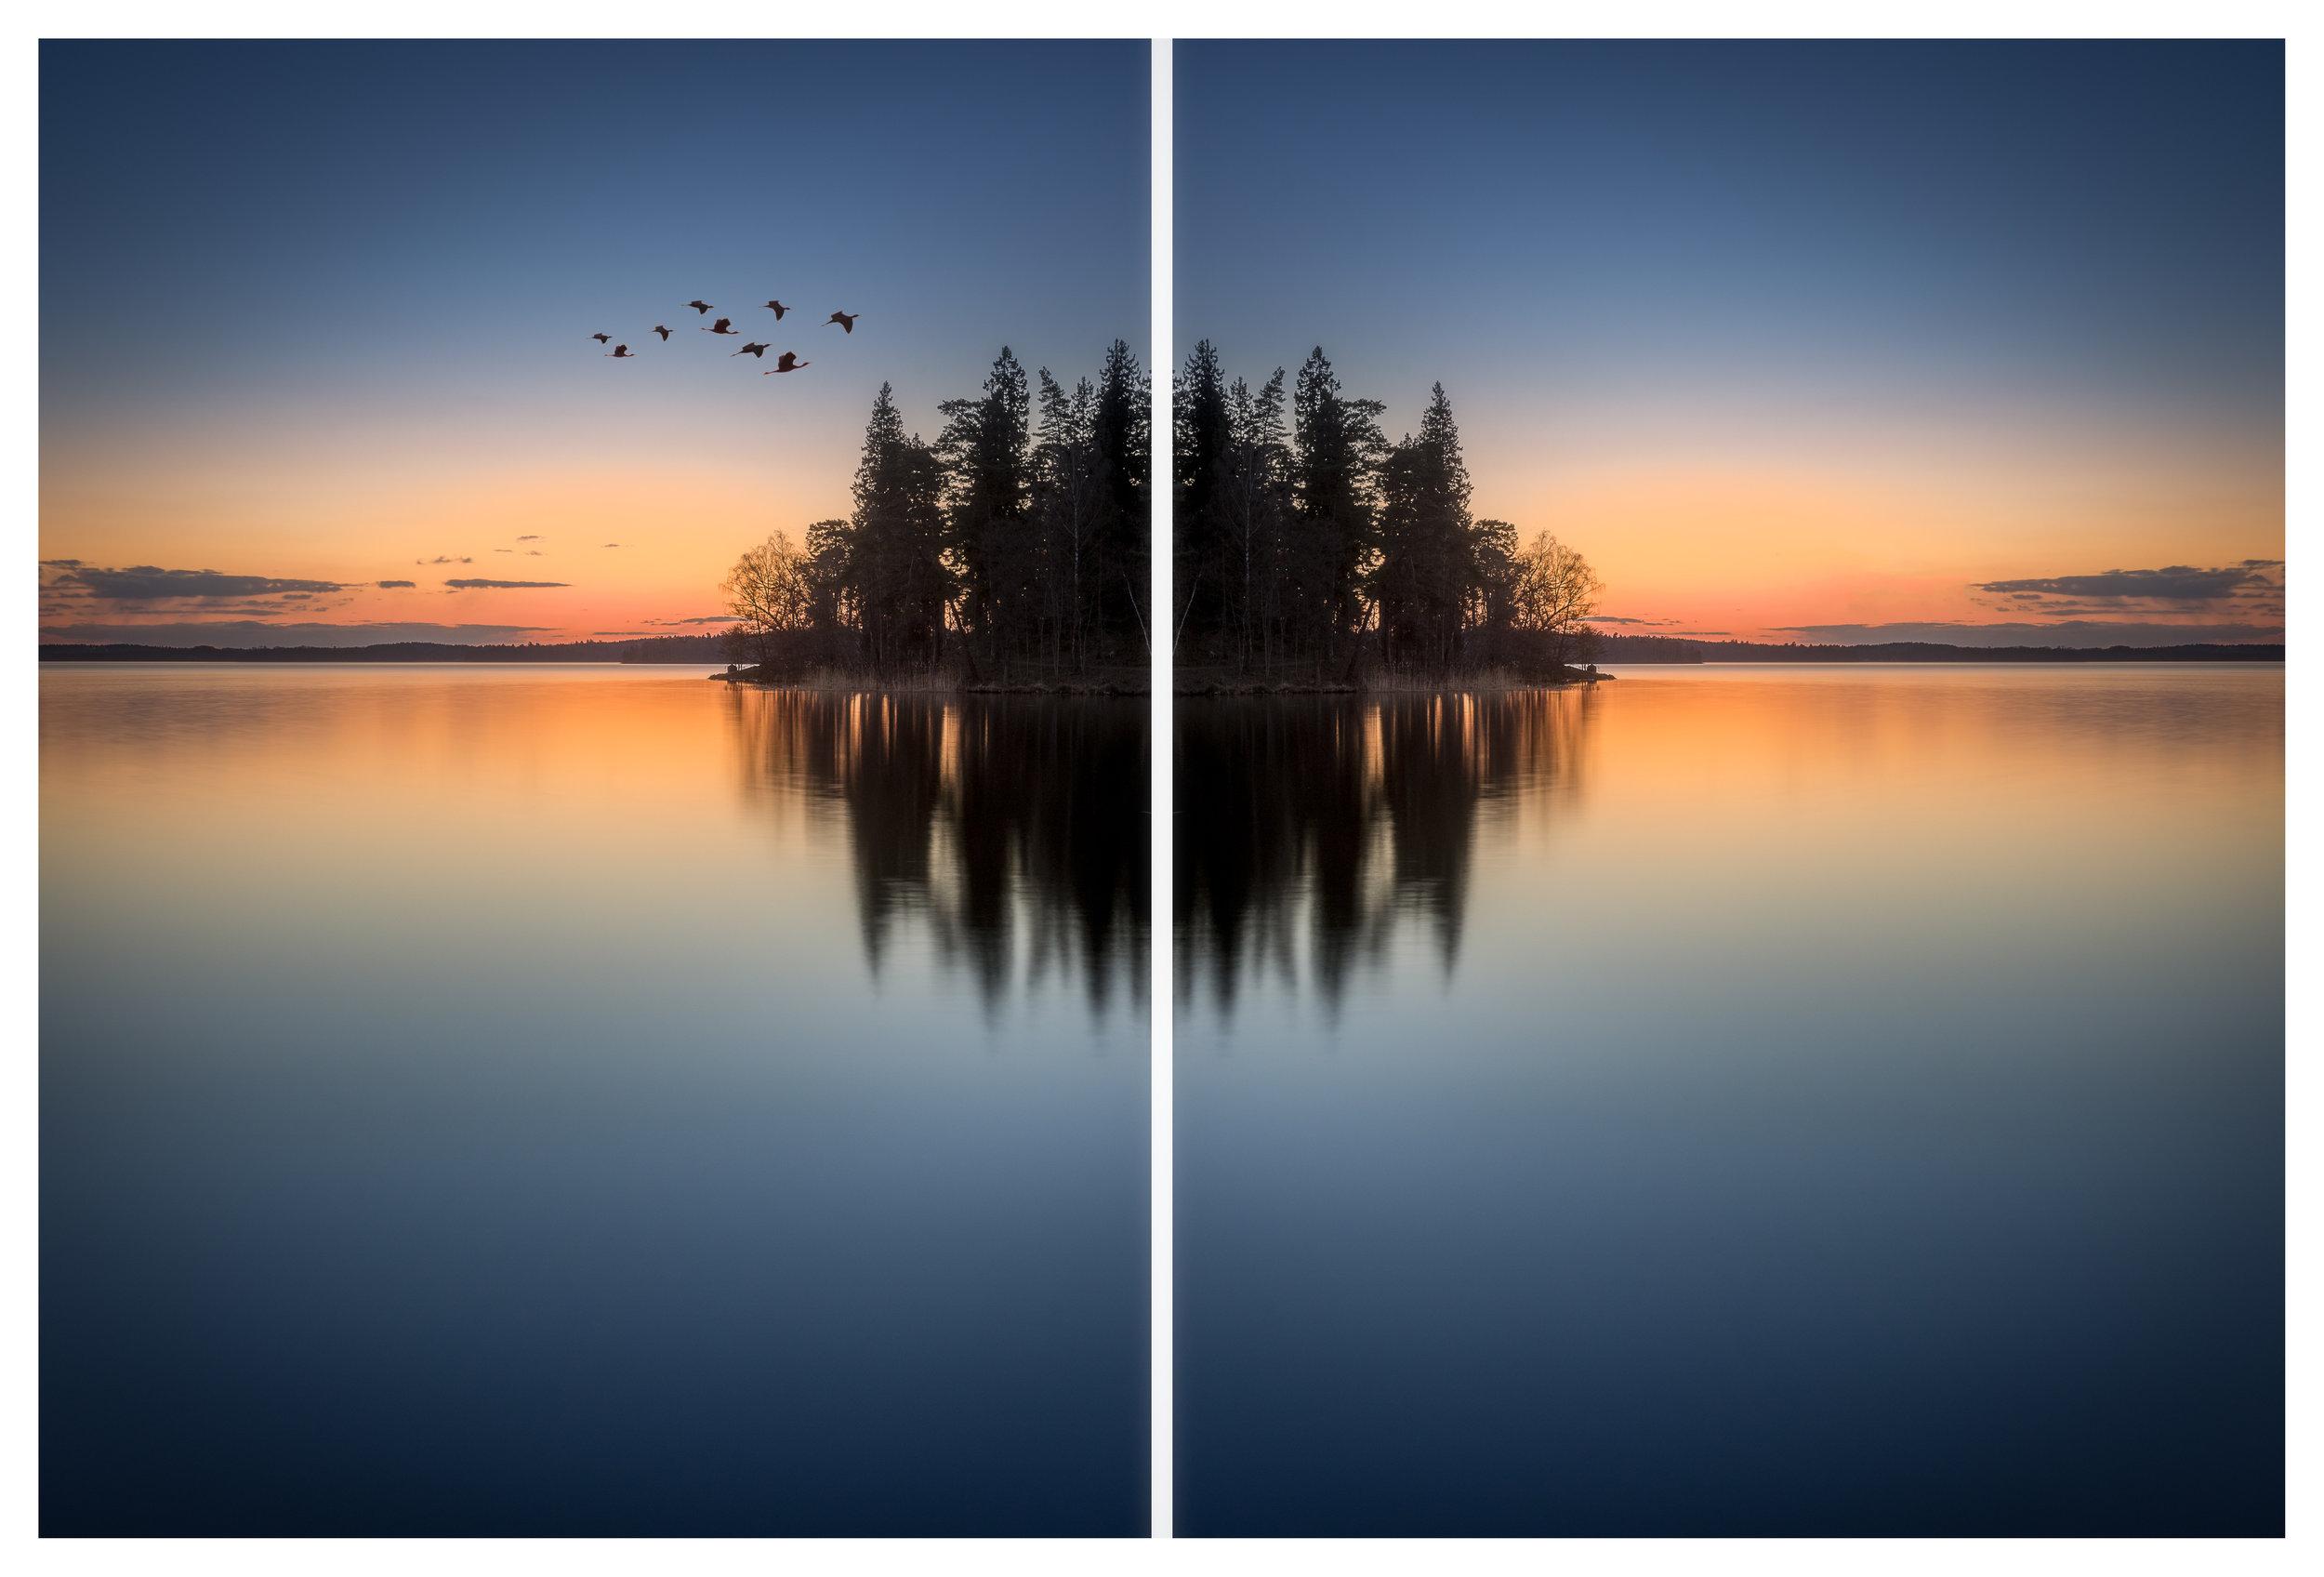 The birds in the opposite